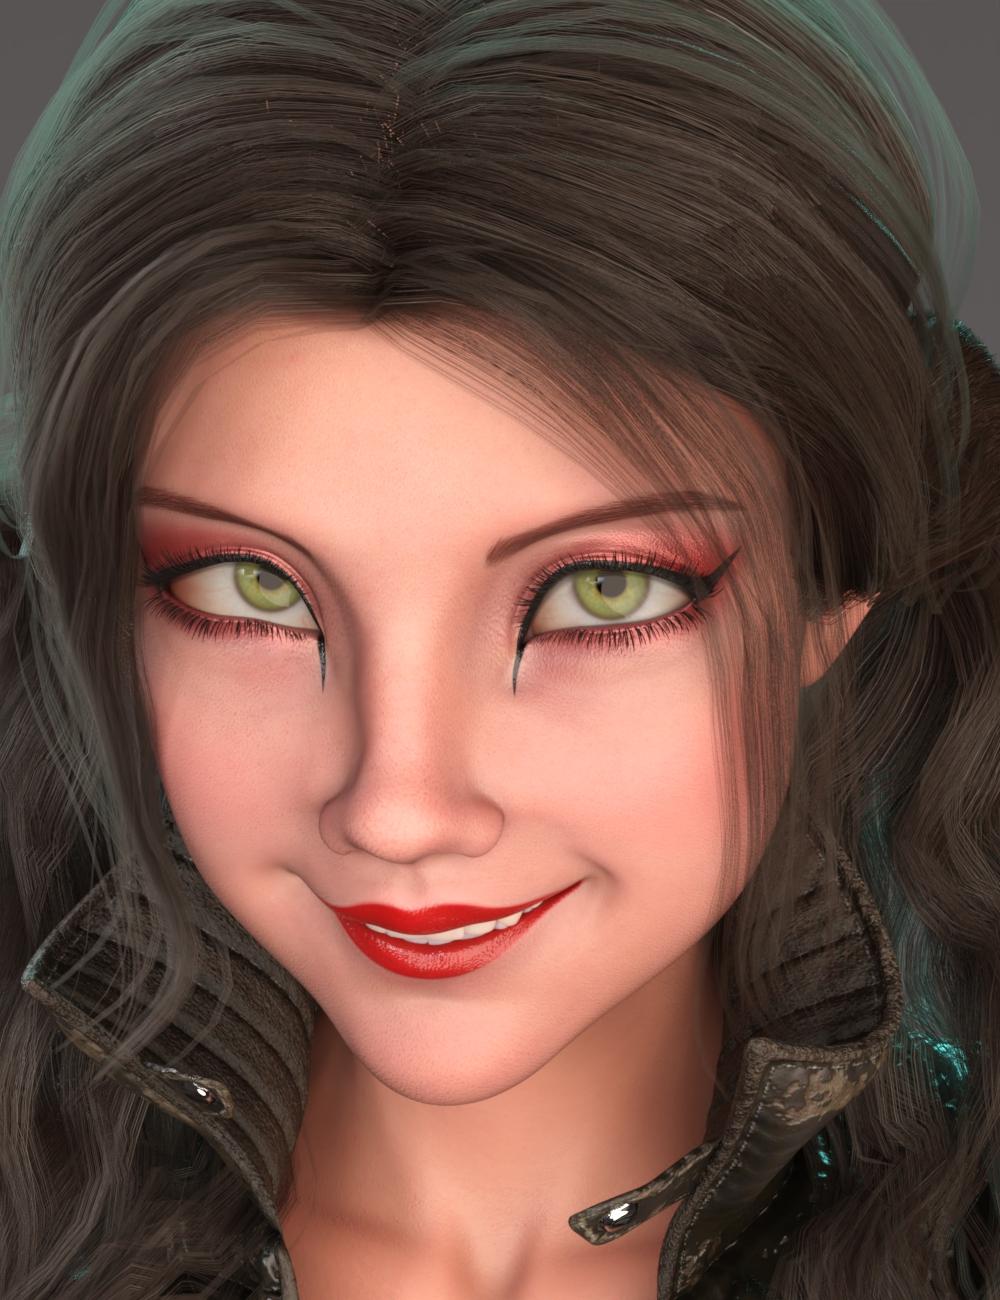 Alternative Shapes for Kiko 8.1 by: AliveSheCried, 3D Models by Daz 3D